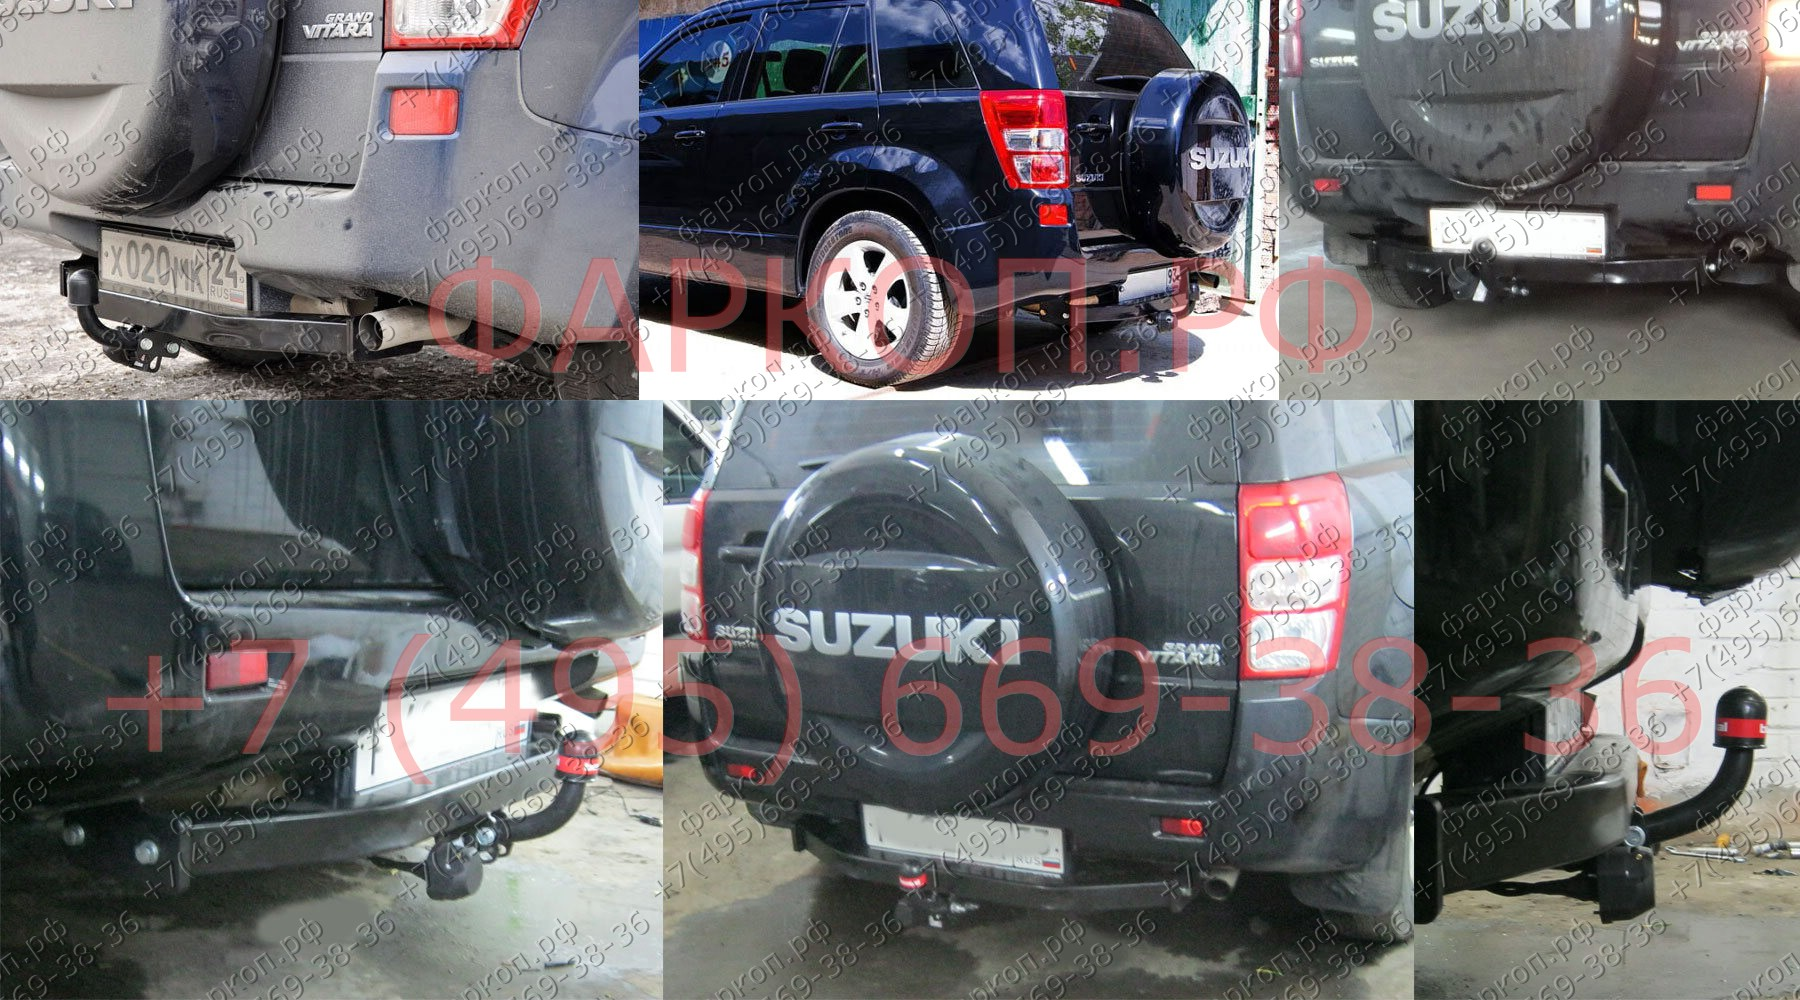 2850-A Фаркоп на Suzuki Grand Vitara 5 дверей 2005/9- Без выреза в бампере.